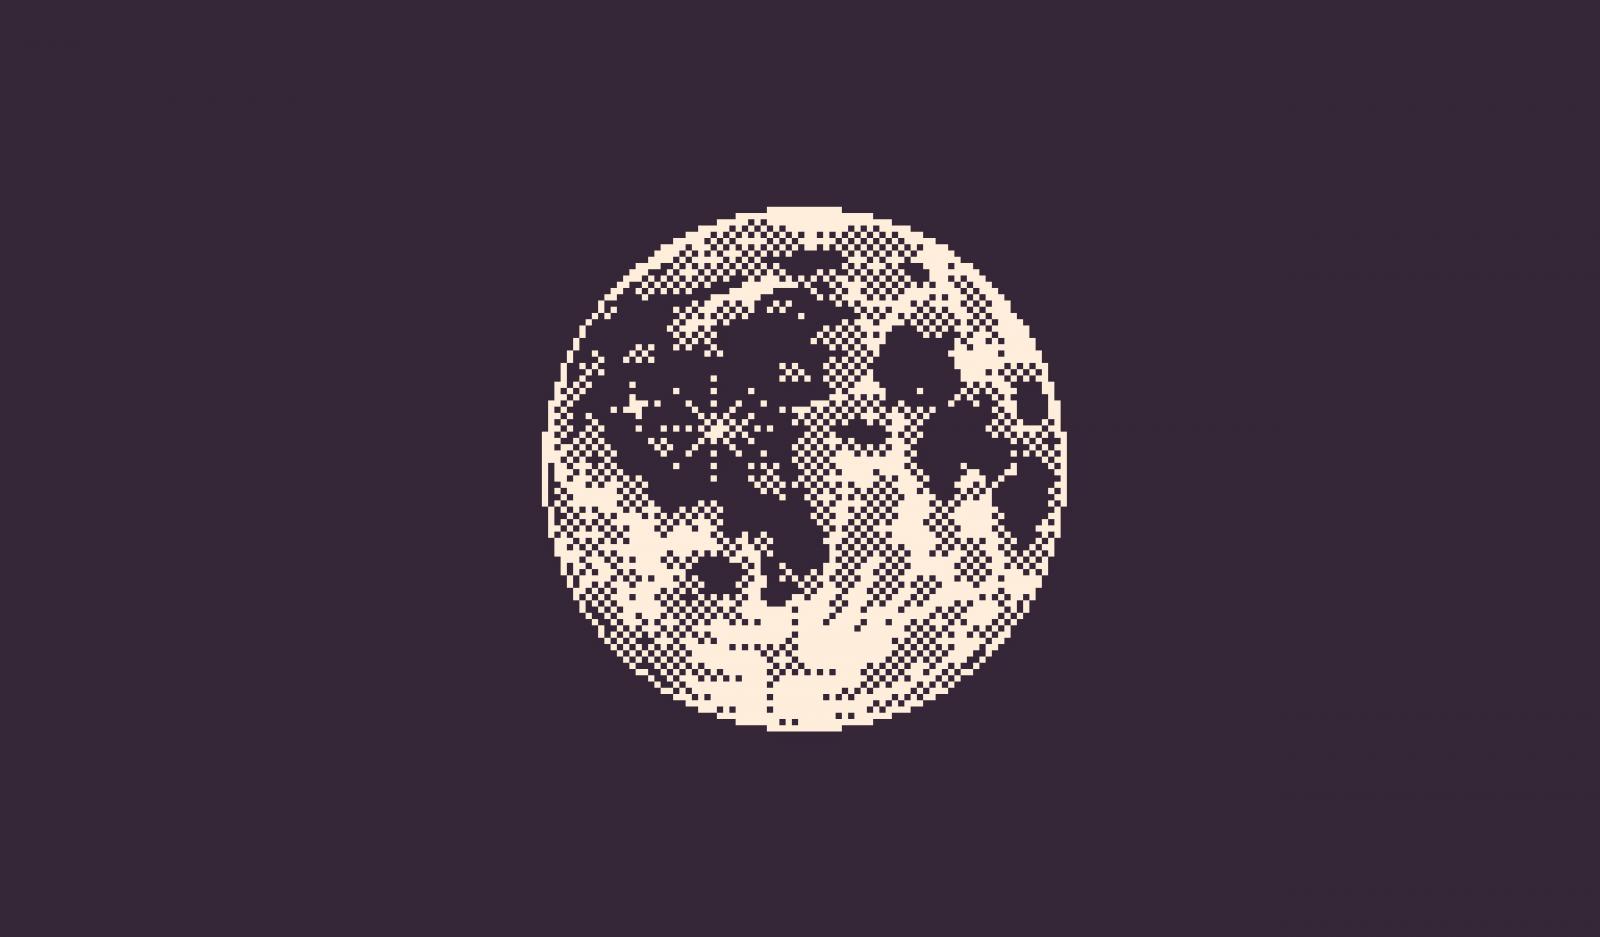 Wallpaper : pixel art, minimalism, purple background ...